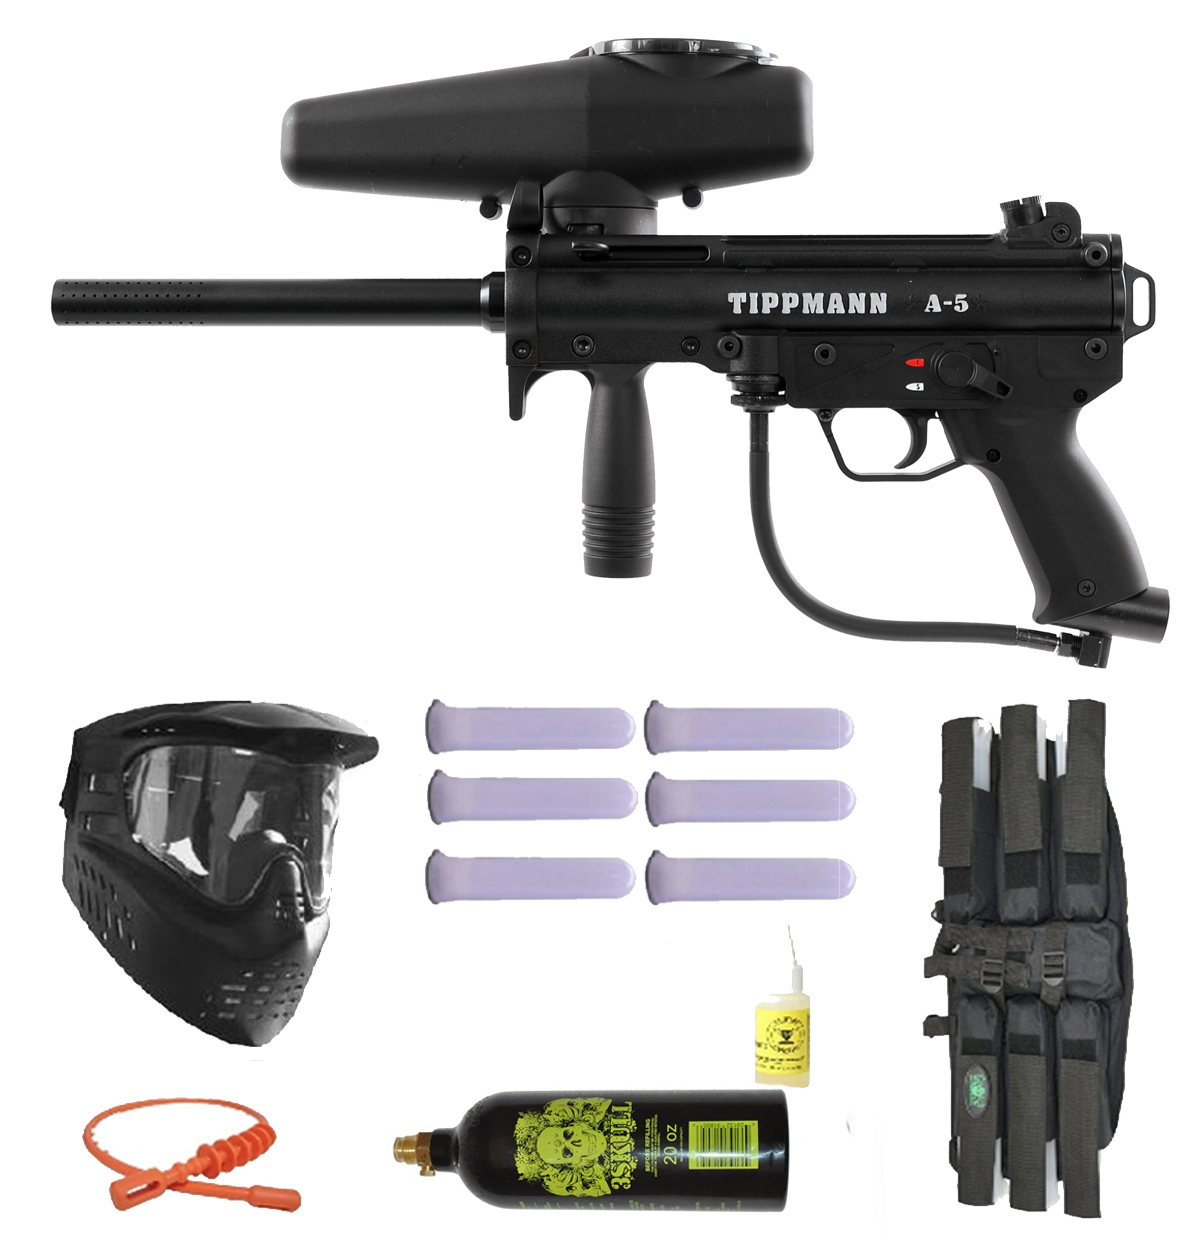 Click here to buy Tippmann A-5 Paintball Marker Gun 3Skull Mega Set by Tippmann Paintball.